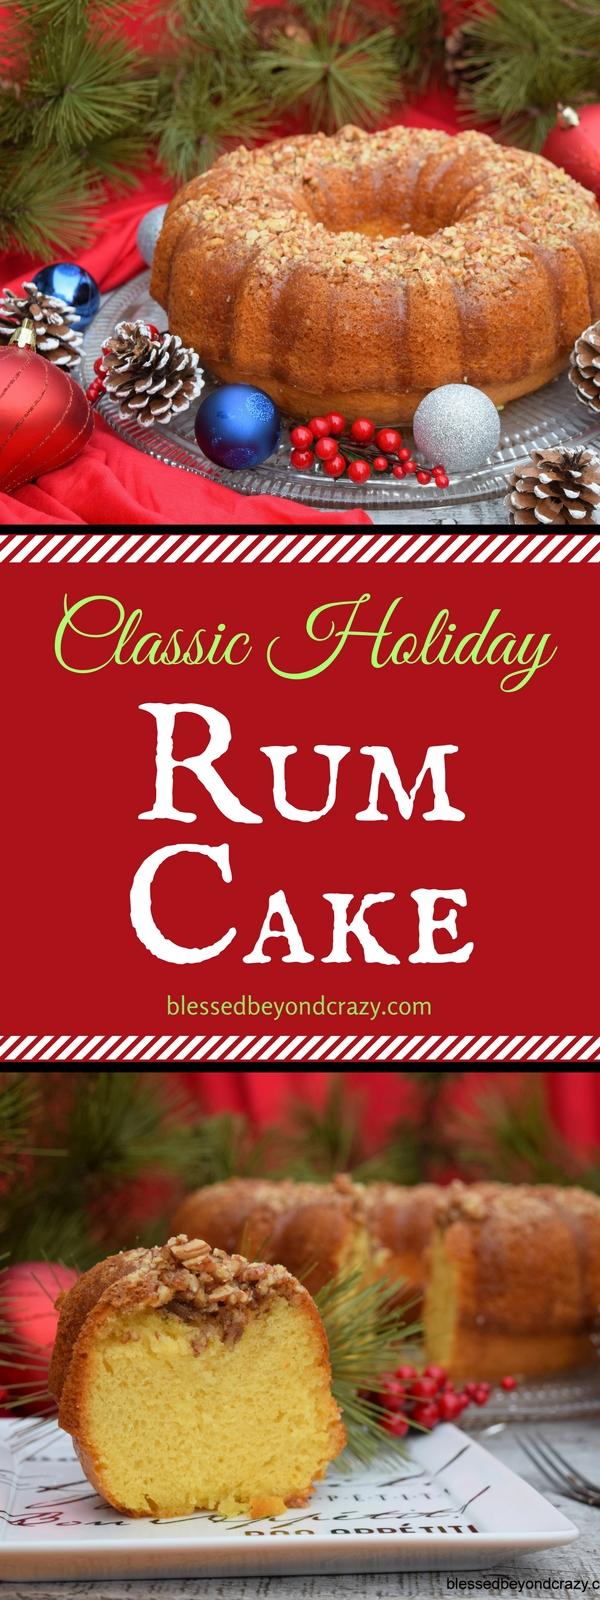 Classic Holiday Rum Cake -